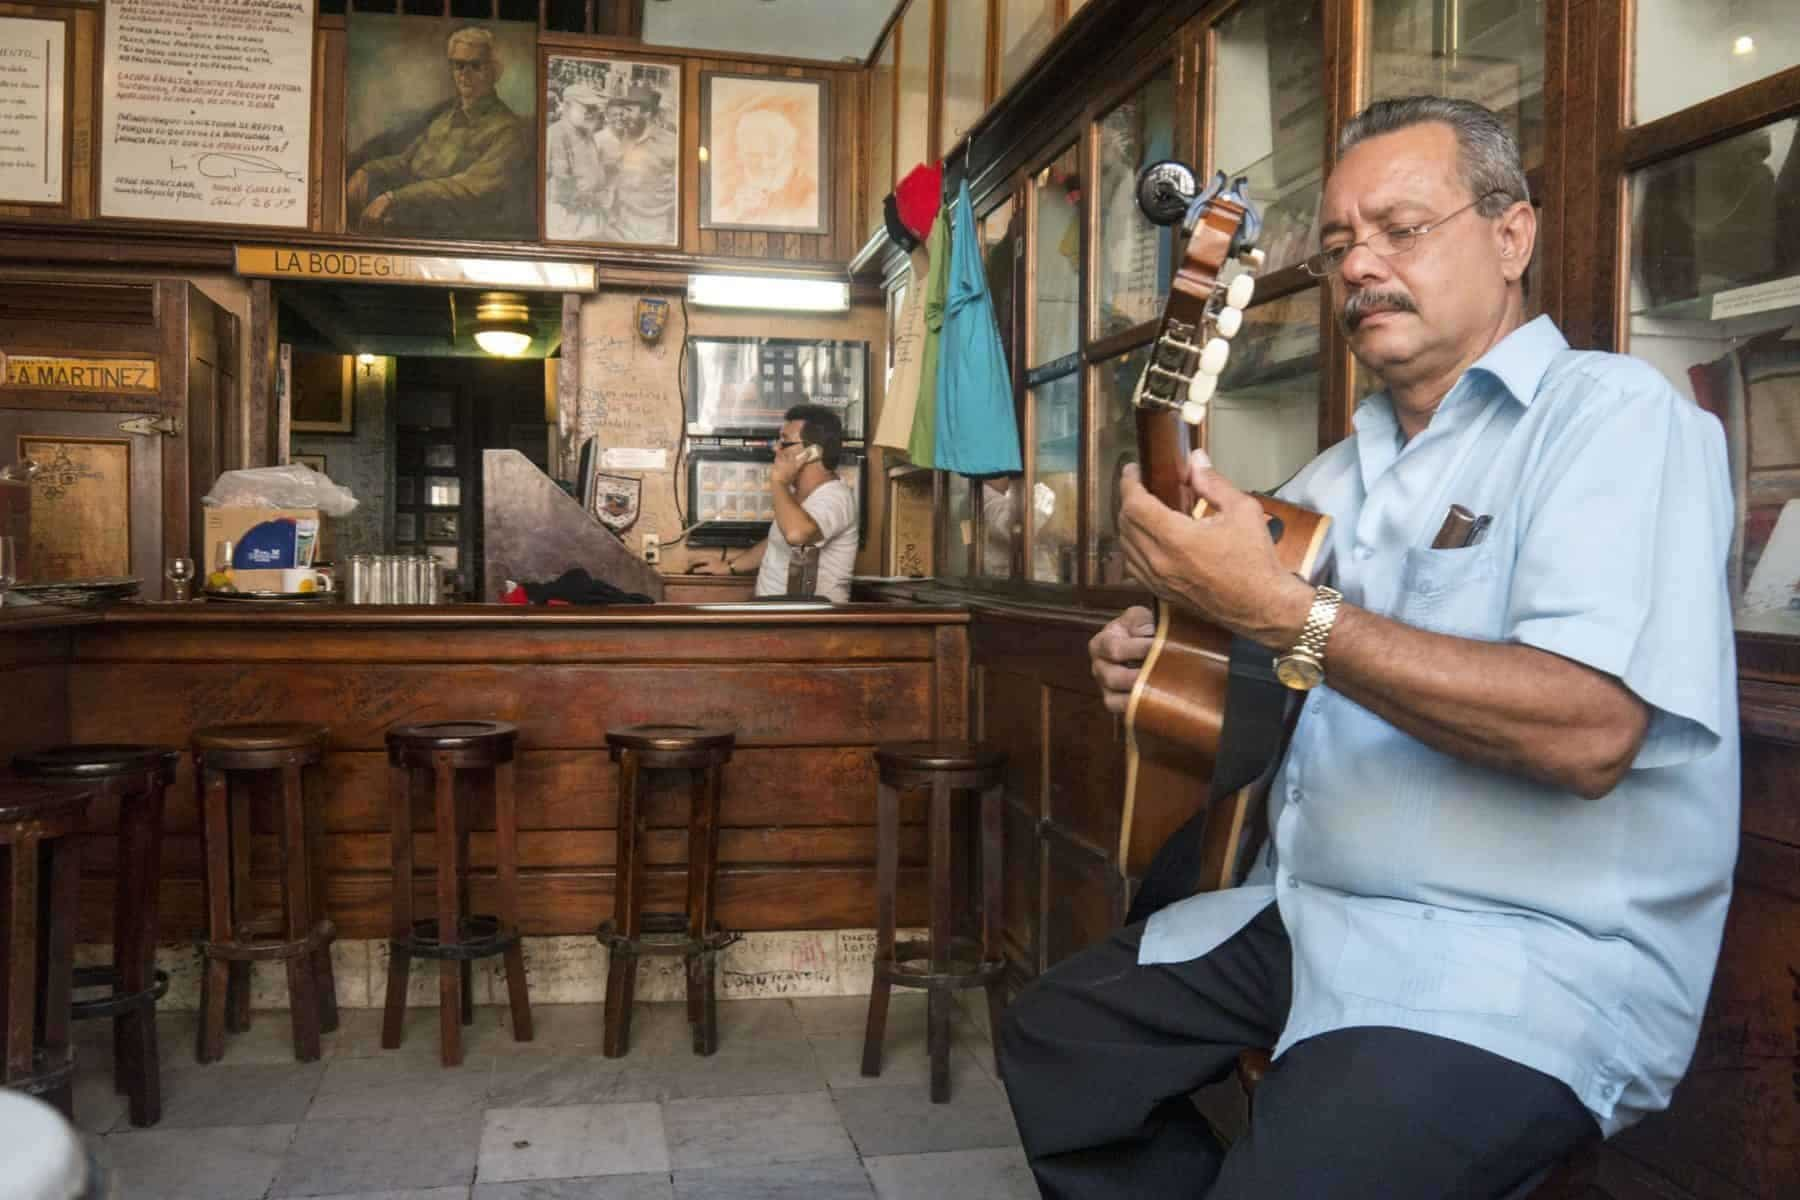 La_Bodeguita_Del_Medio,_La_Habana_Vieja